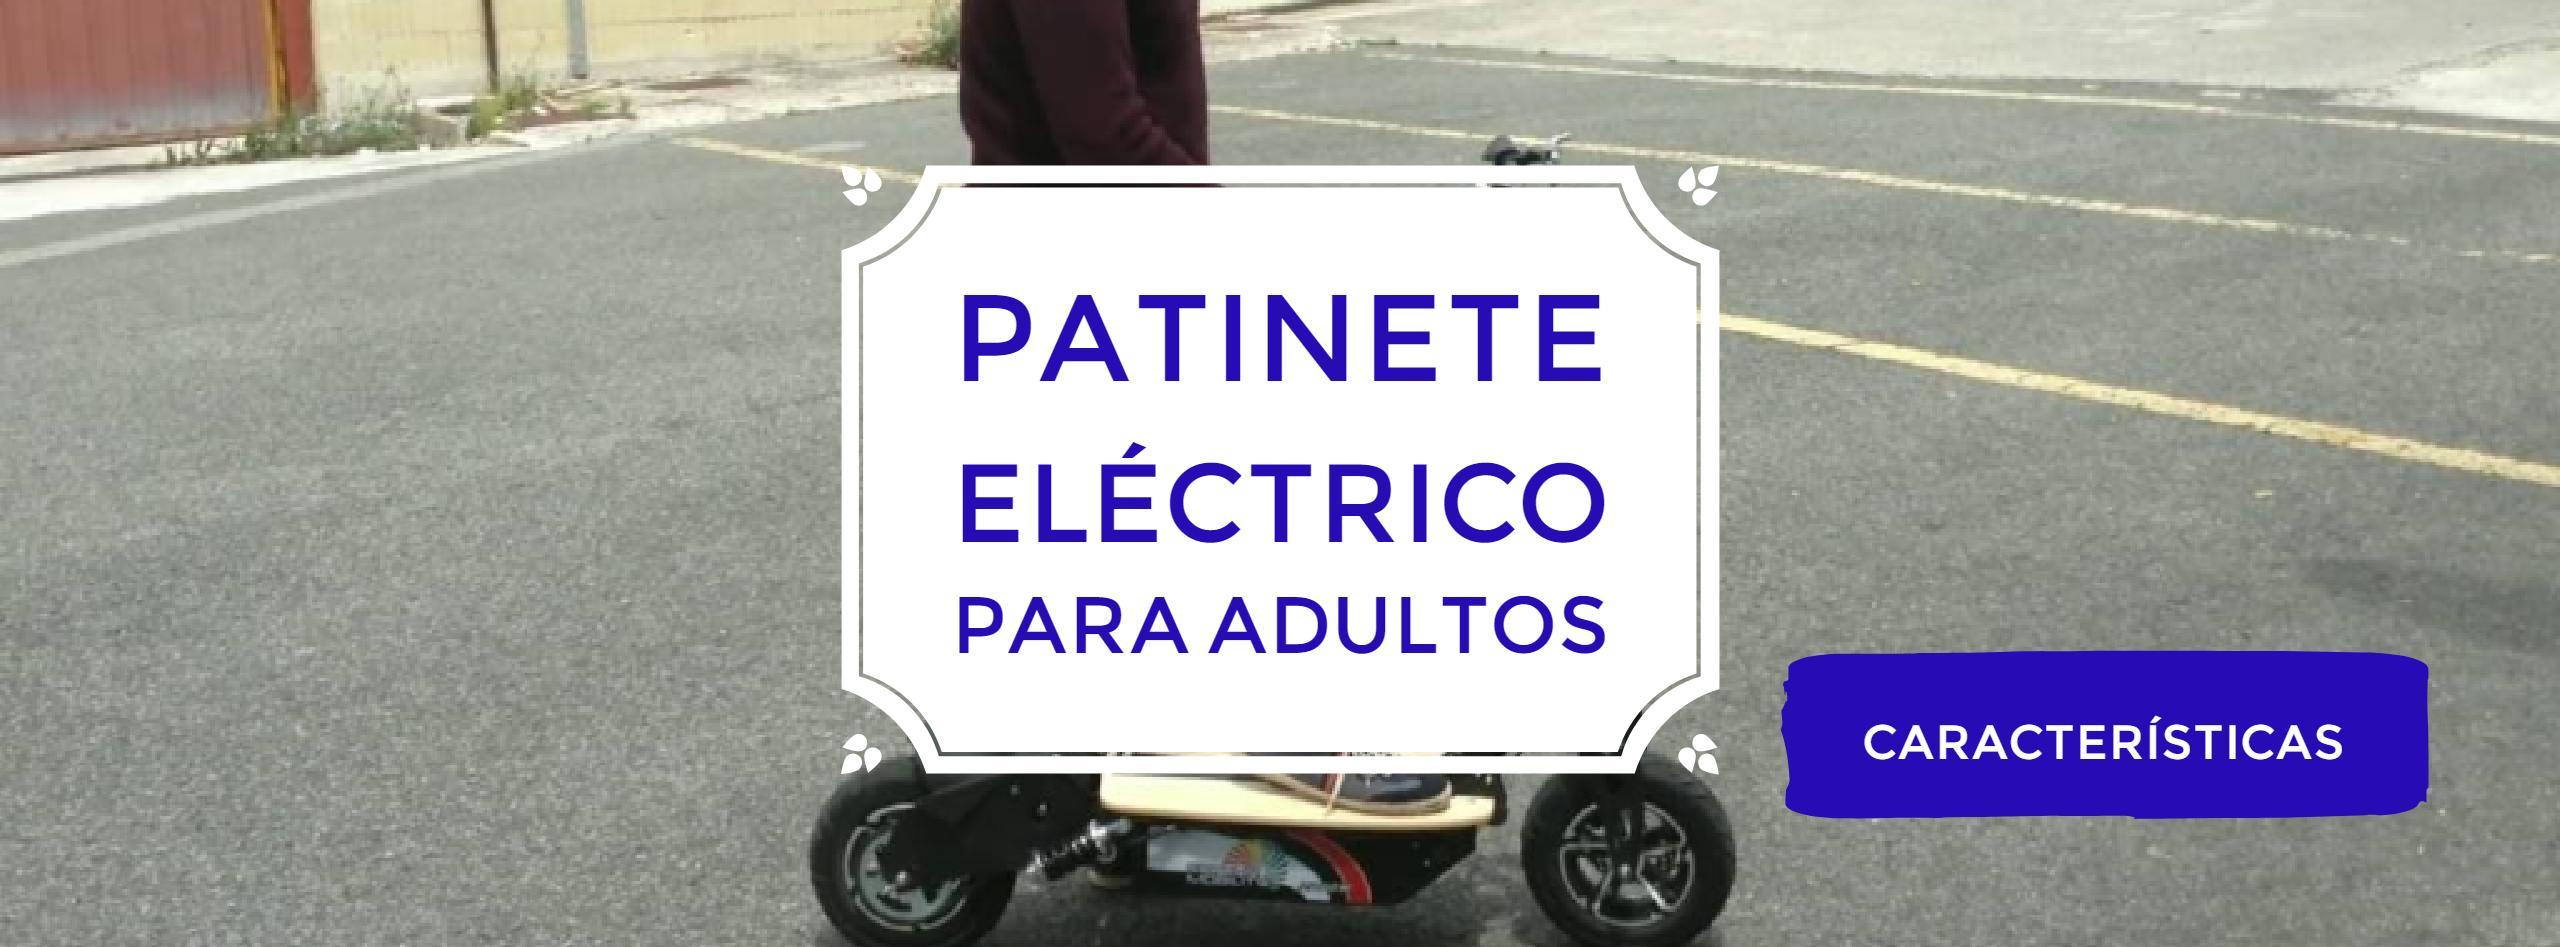 - Patinetes eléctricos para adultos